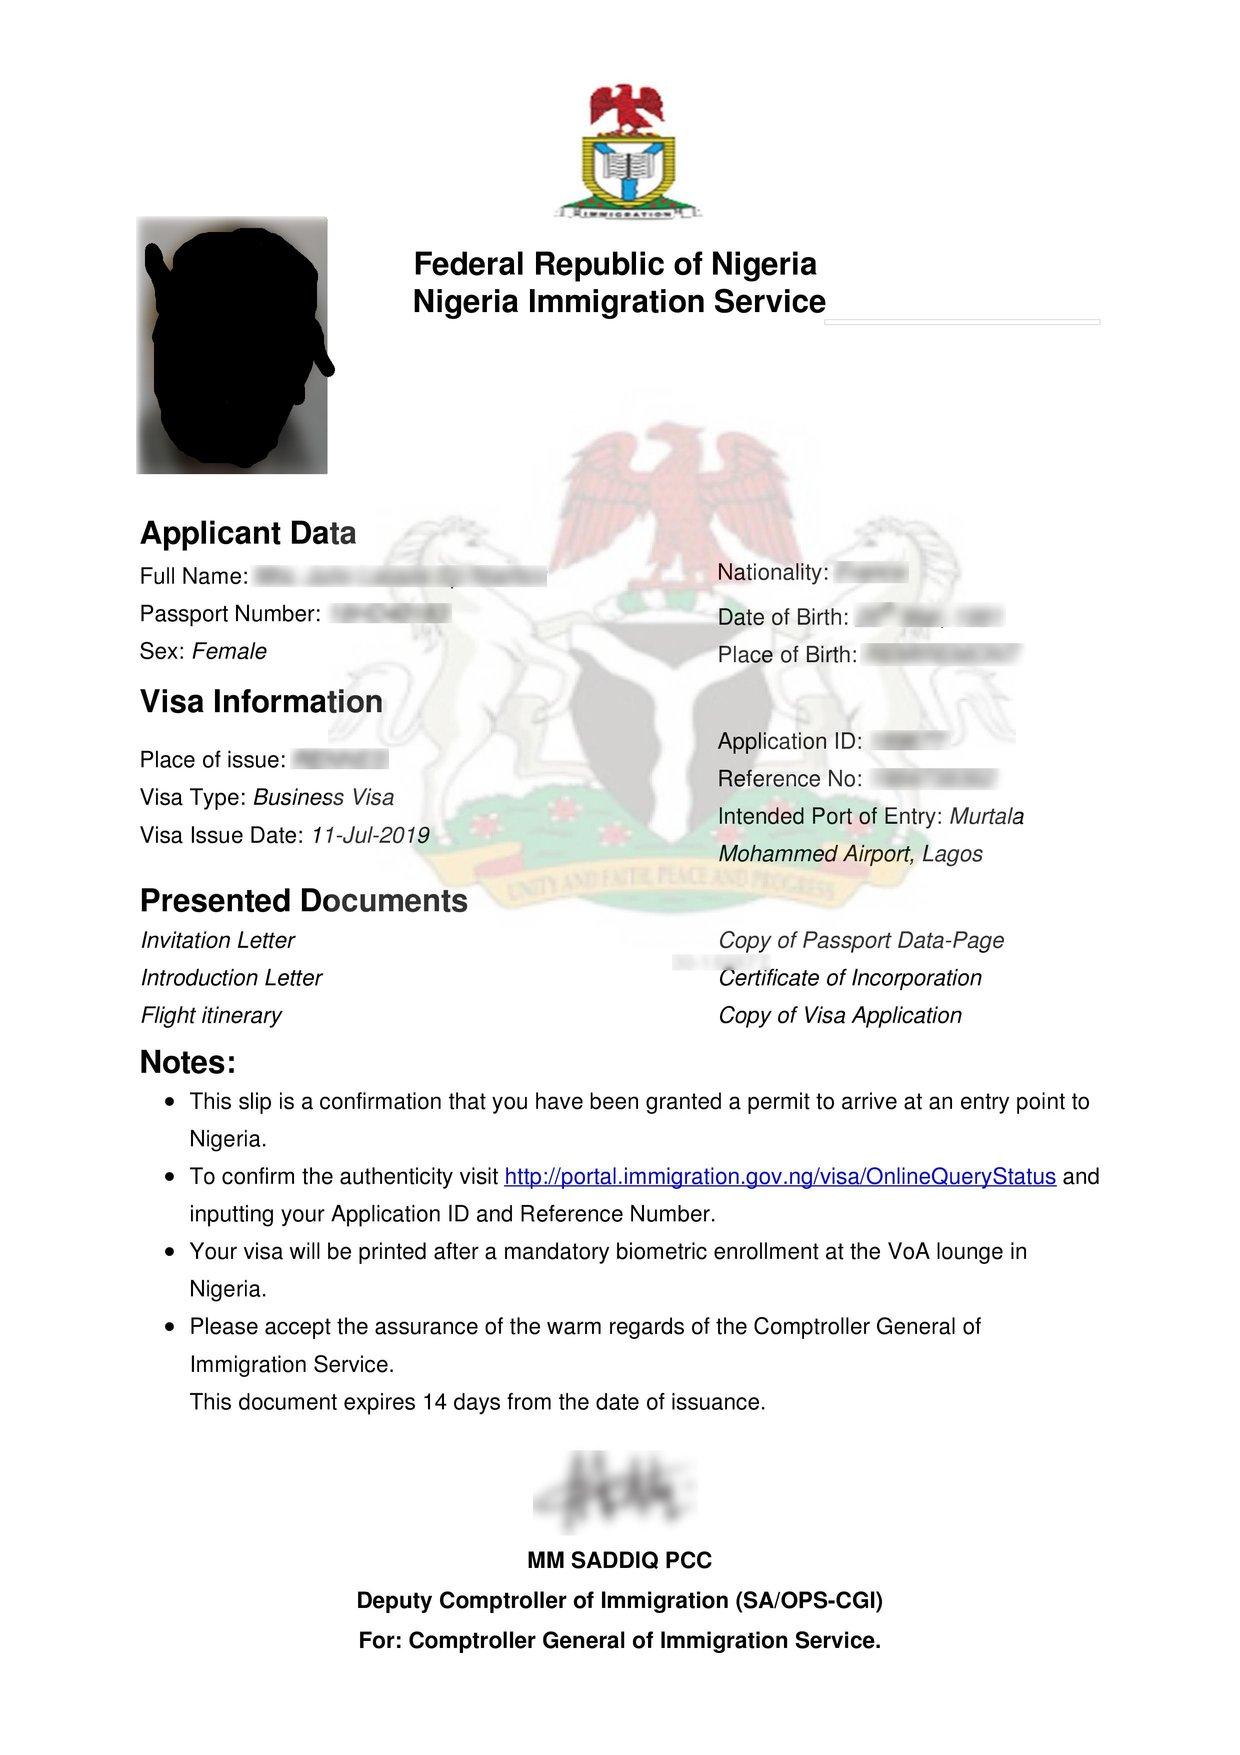 approval letter for visa